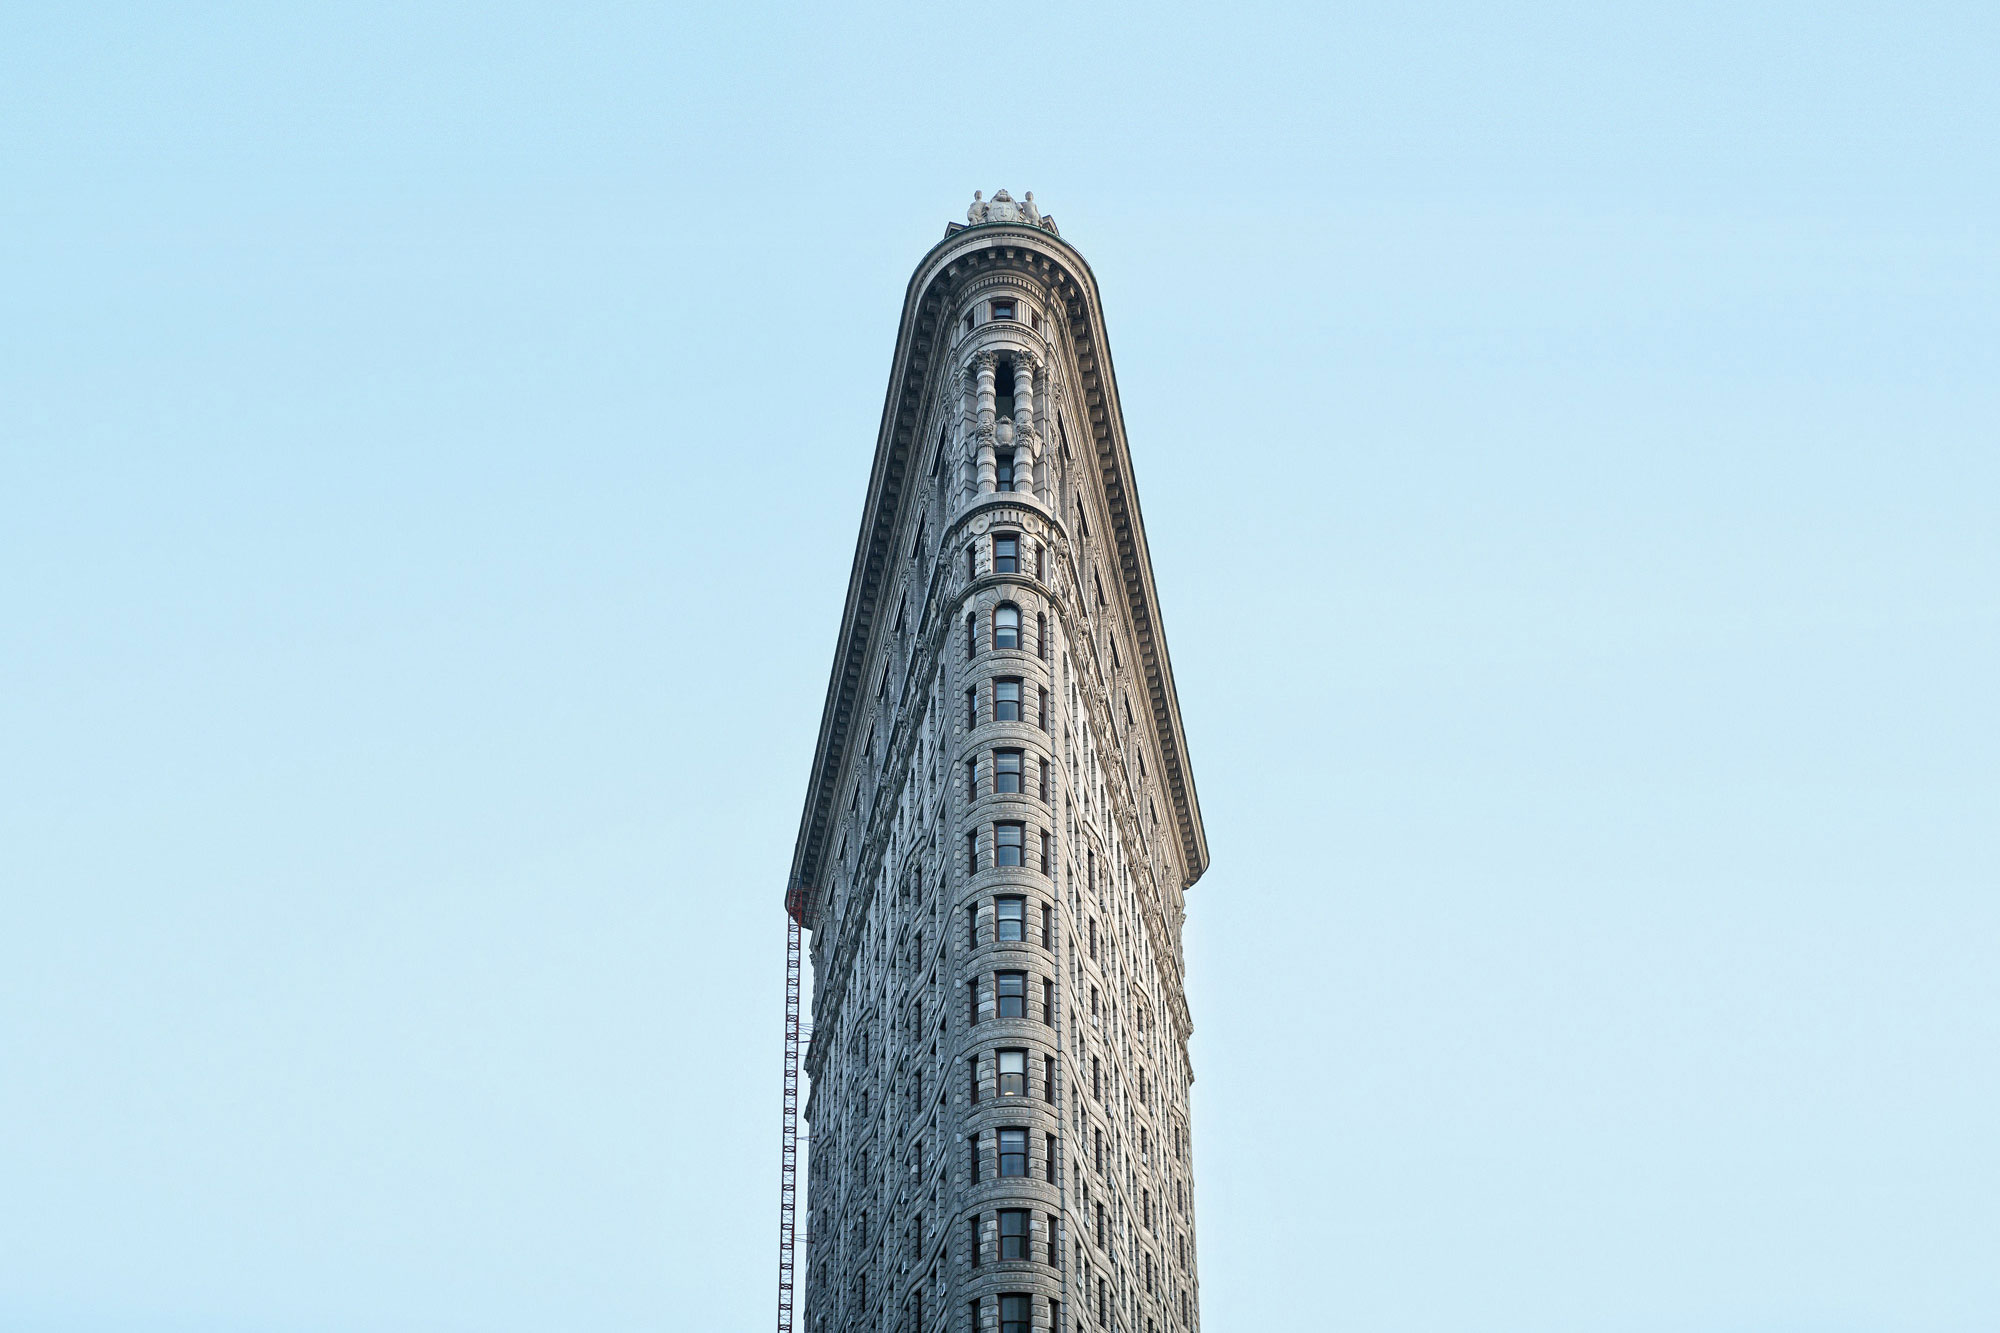 Flatiron Building, New York, USA, 2006